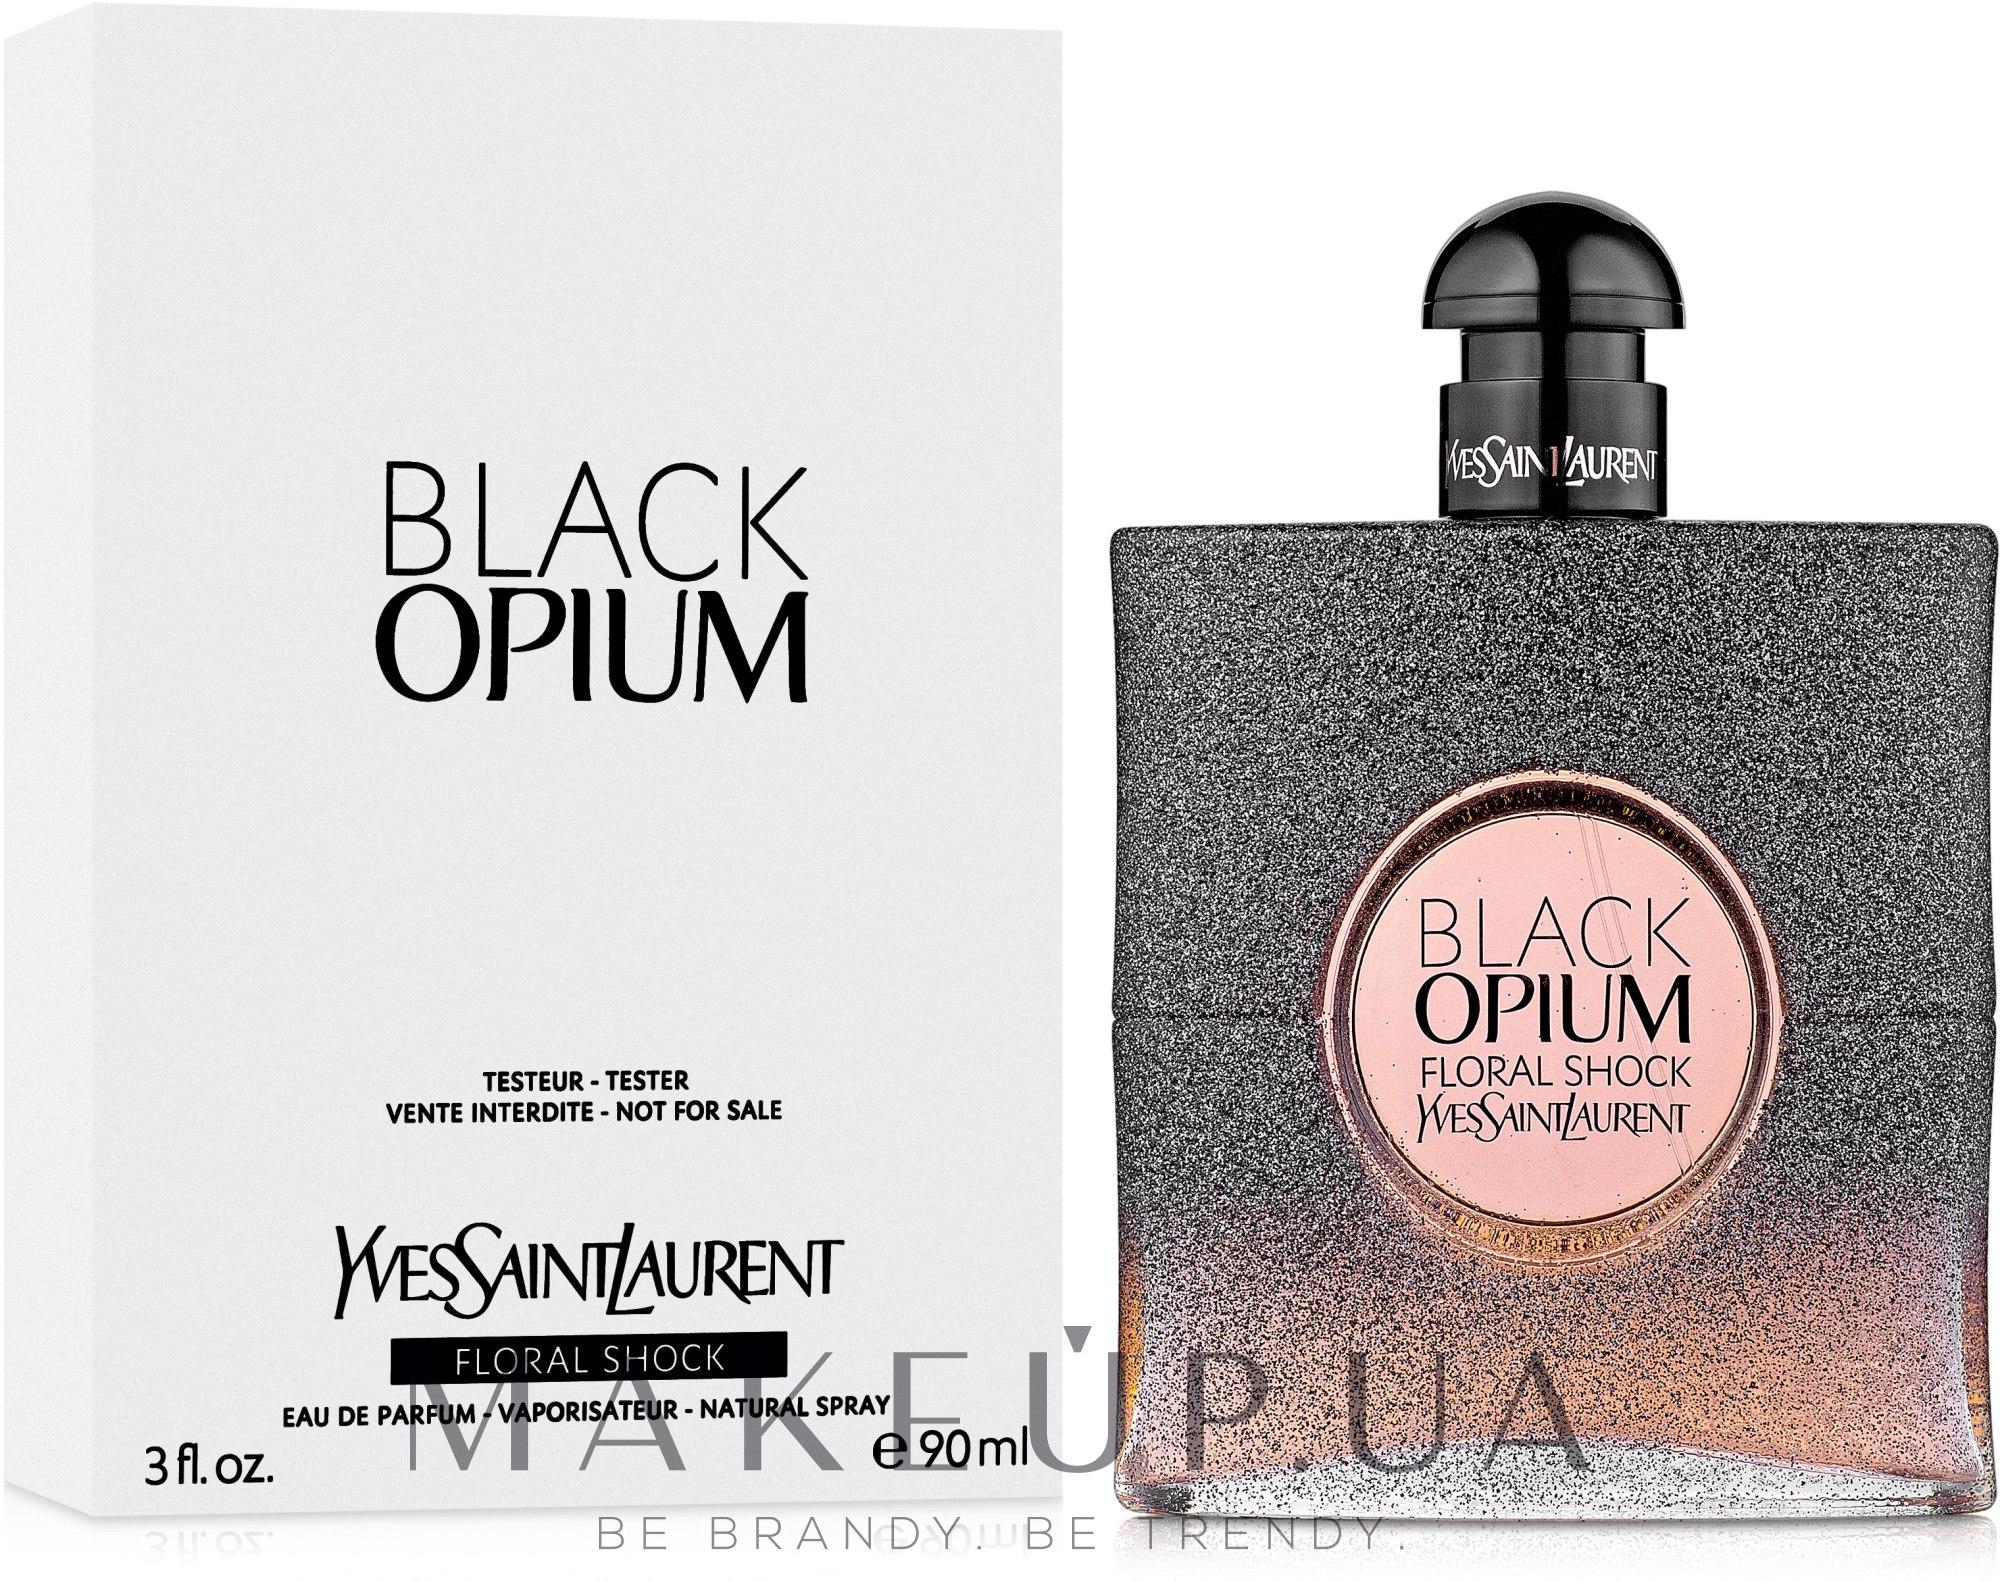 Makeup Yves Saint Laurent Black Opium Floral Shock